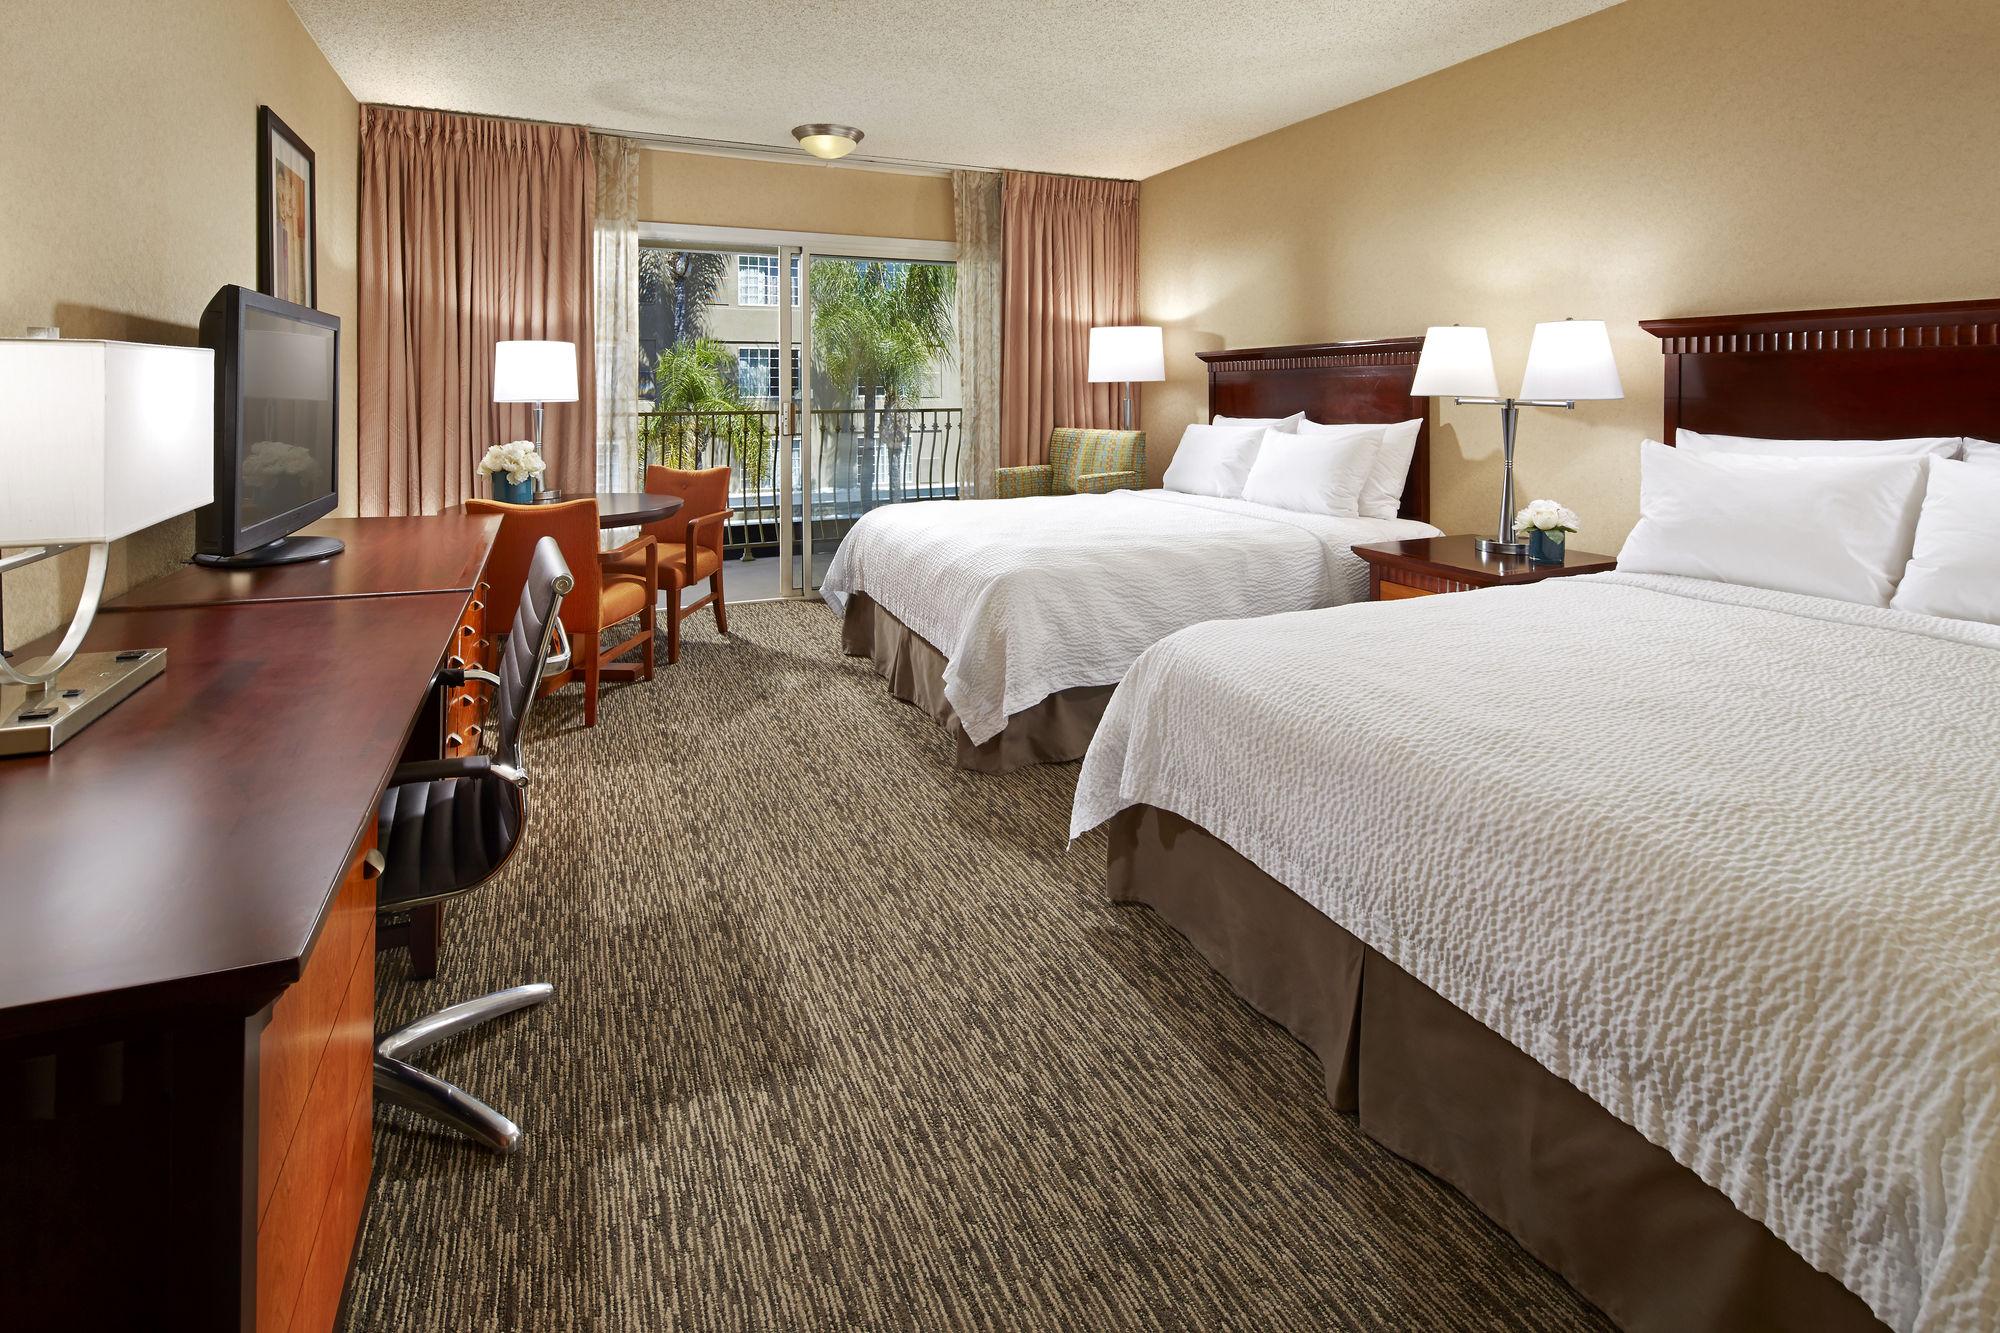 Anaheim hotel coupons for anaheim california - Sheraton garden grove anaheim south ...